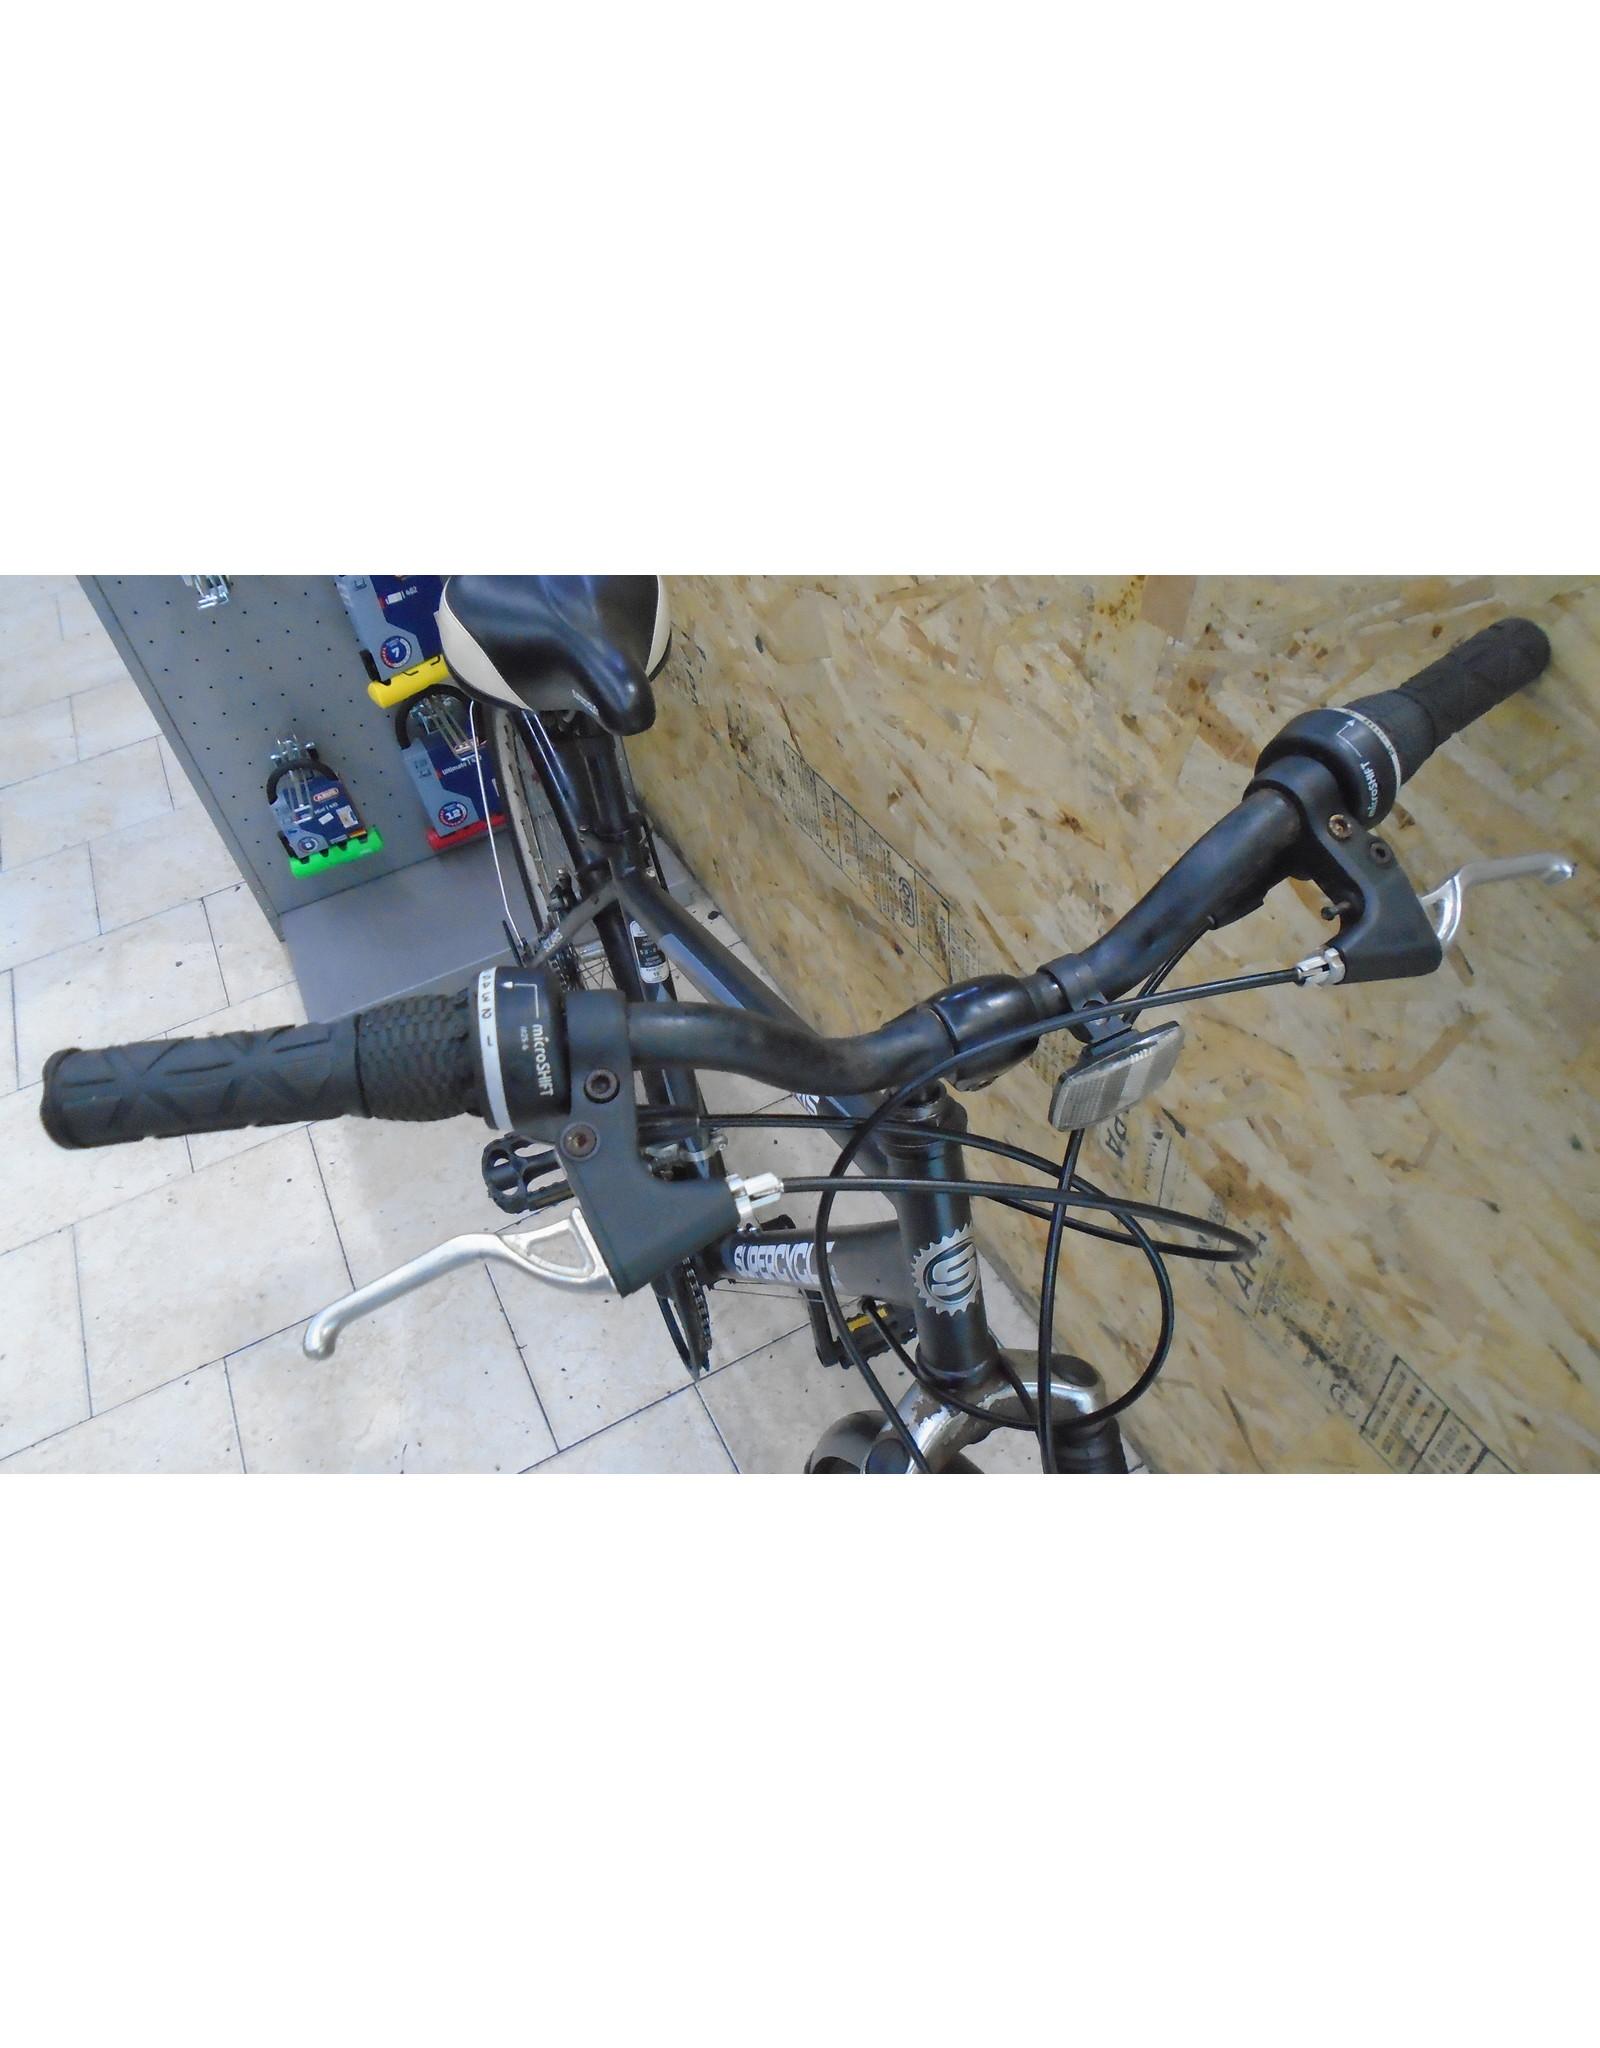 "Vélo usagé hybride Supercycle 18"" - 10368"